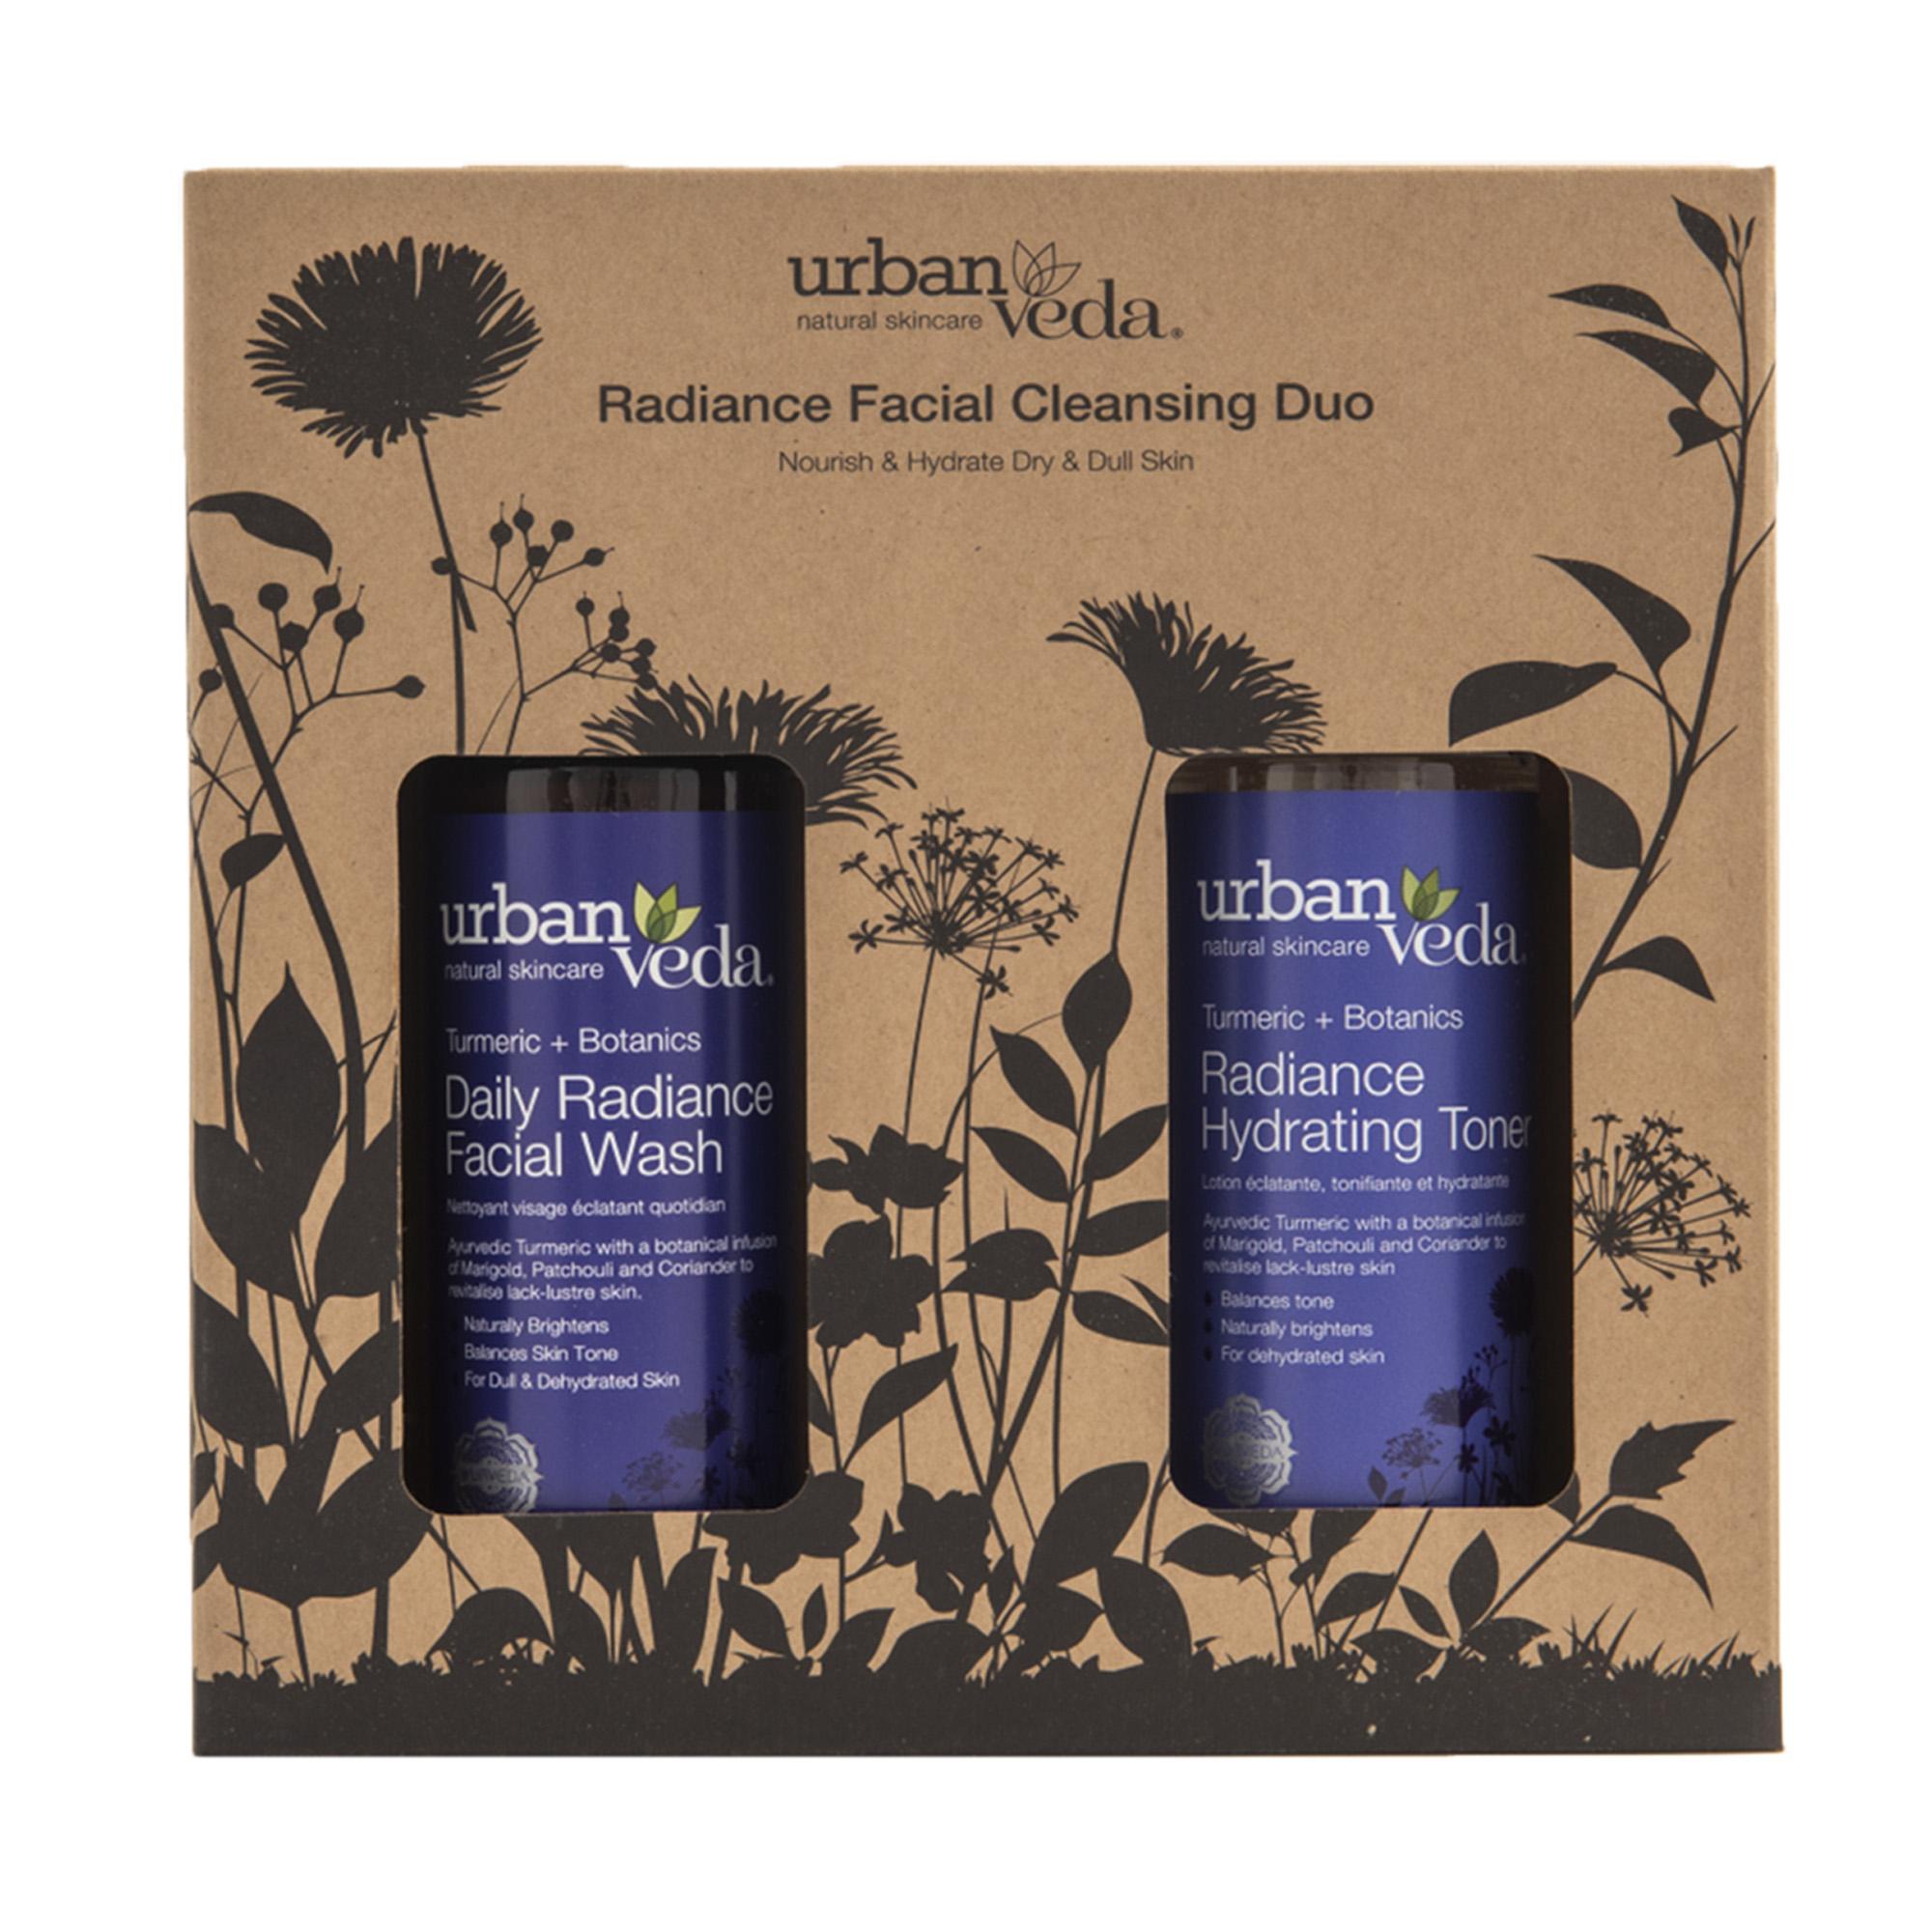 Urban Veda | Urban Veda Radiance Facial Cleansing Duo